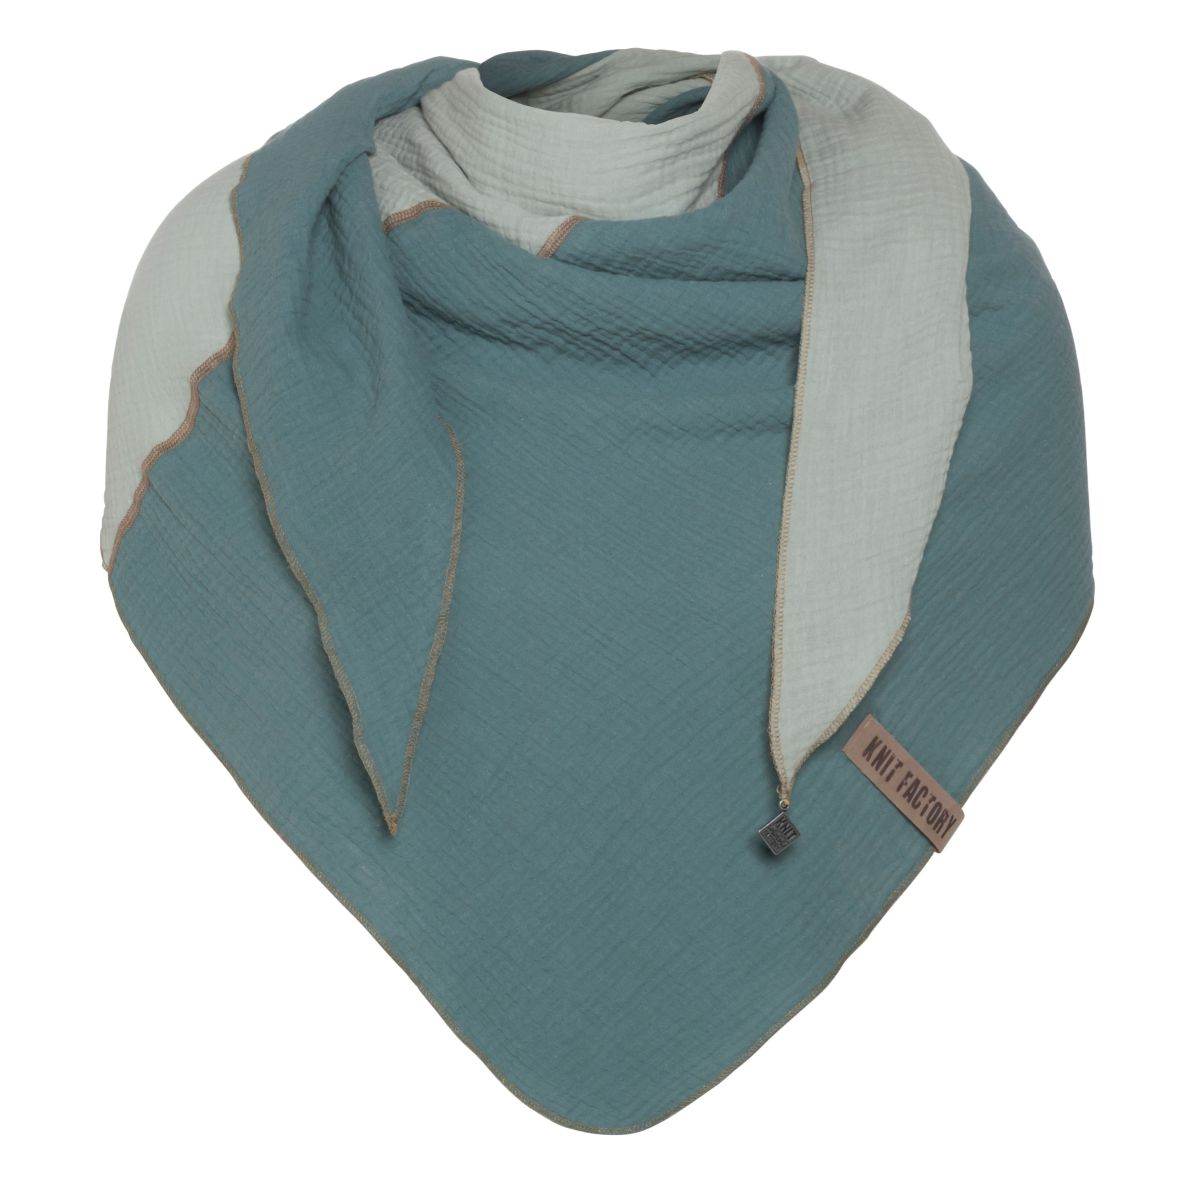 fay triangle scarf stone greenvintage green